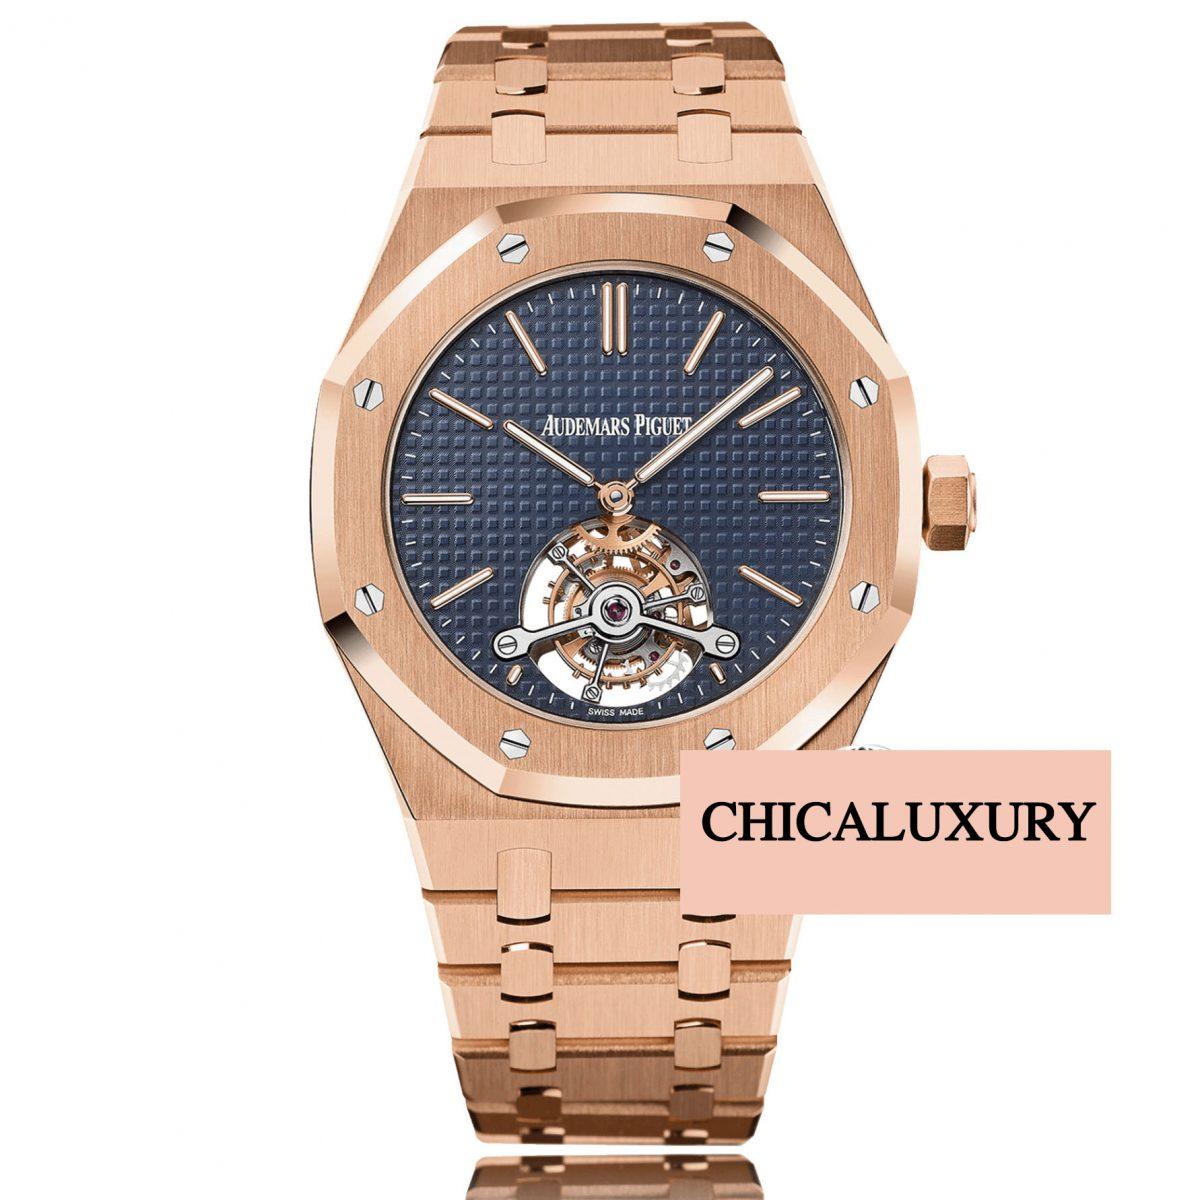 audemars-piguet-royal-oak-tourbillon-extra-thin-pink-gold-26510or-oo-1220or-01